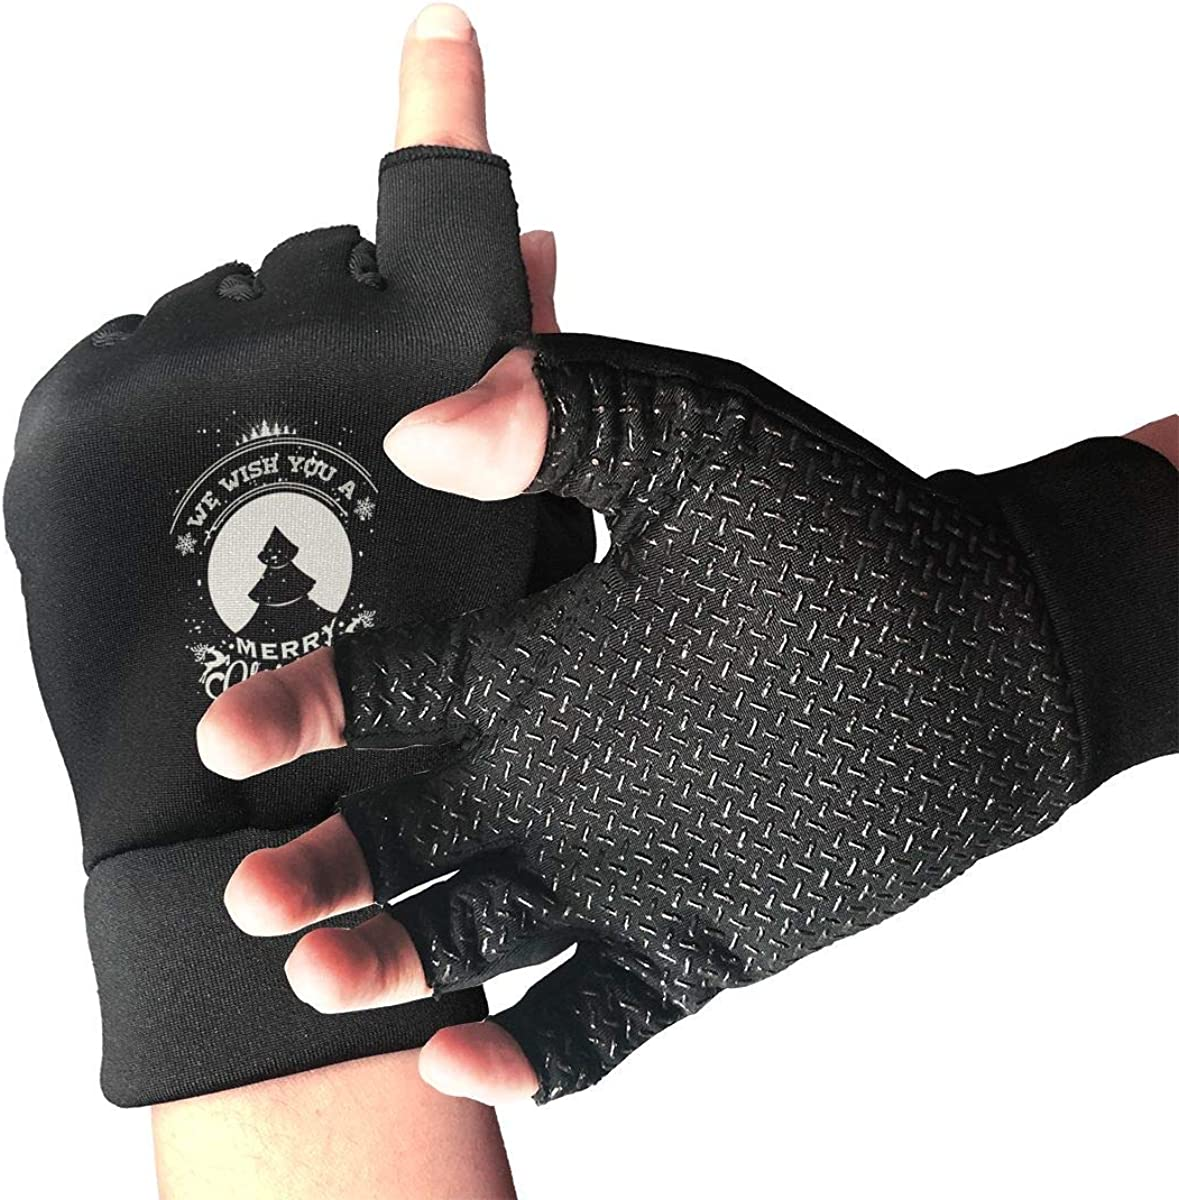 Gloves Merry Christmas Tree Fingerless Gloves Short Touchscreen Gloves Winter Motorcycle Biker Mitten